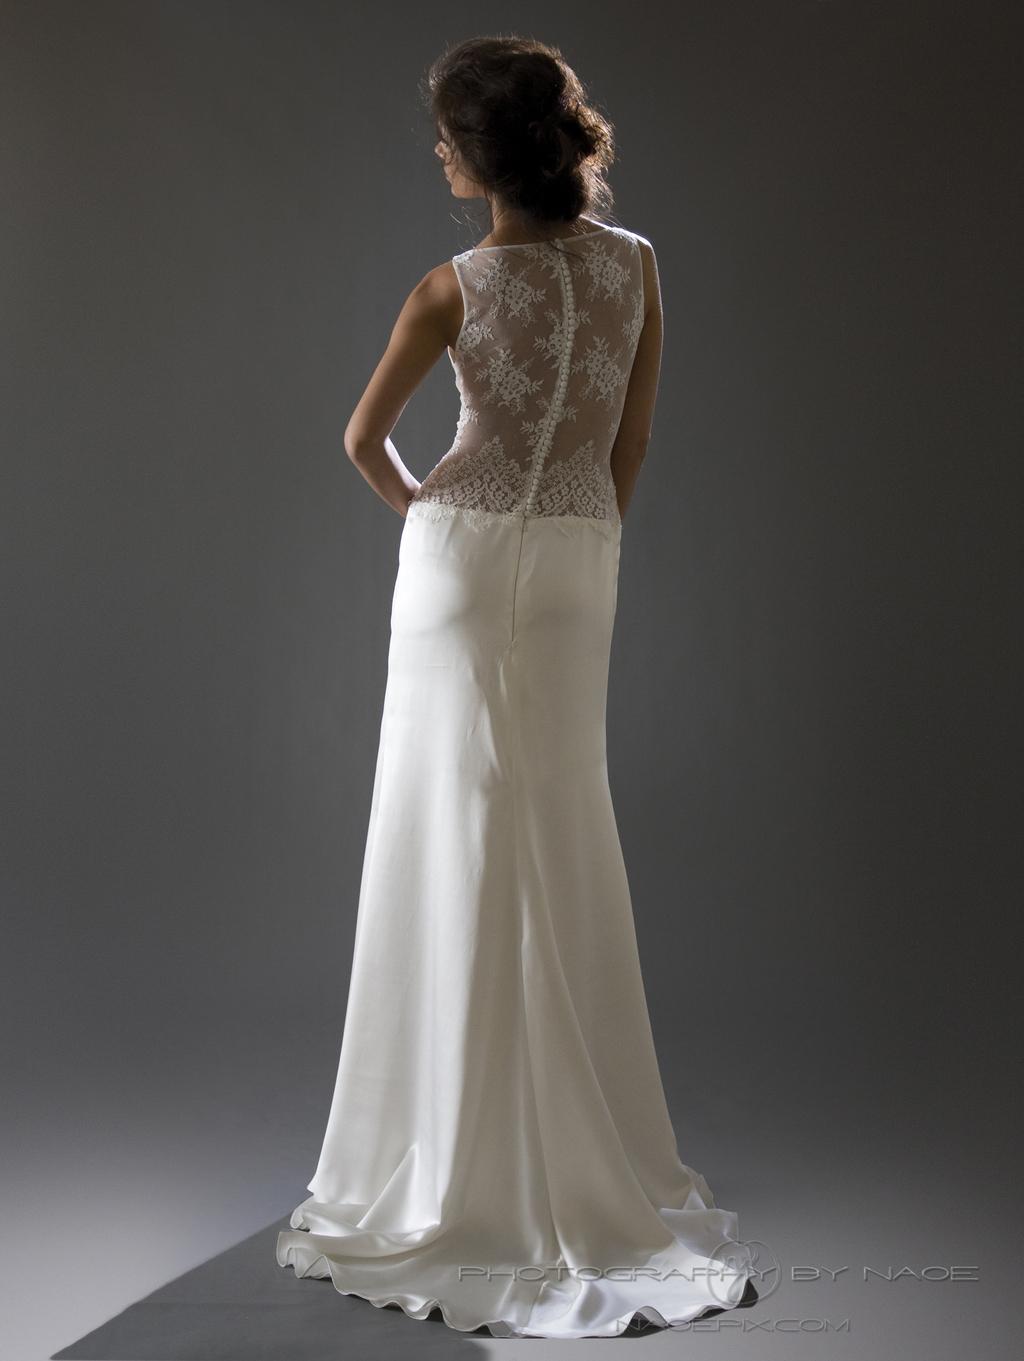 Wedding-dress-spring-2013-bridal_gown-cocoe-voci-12-back.full